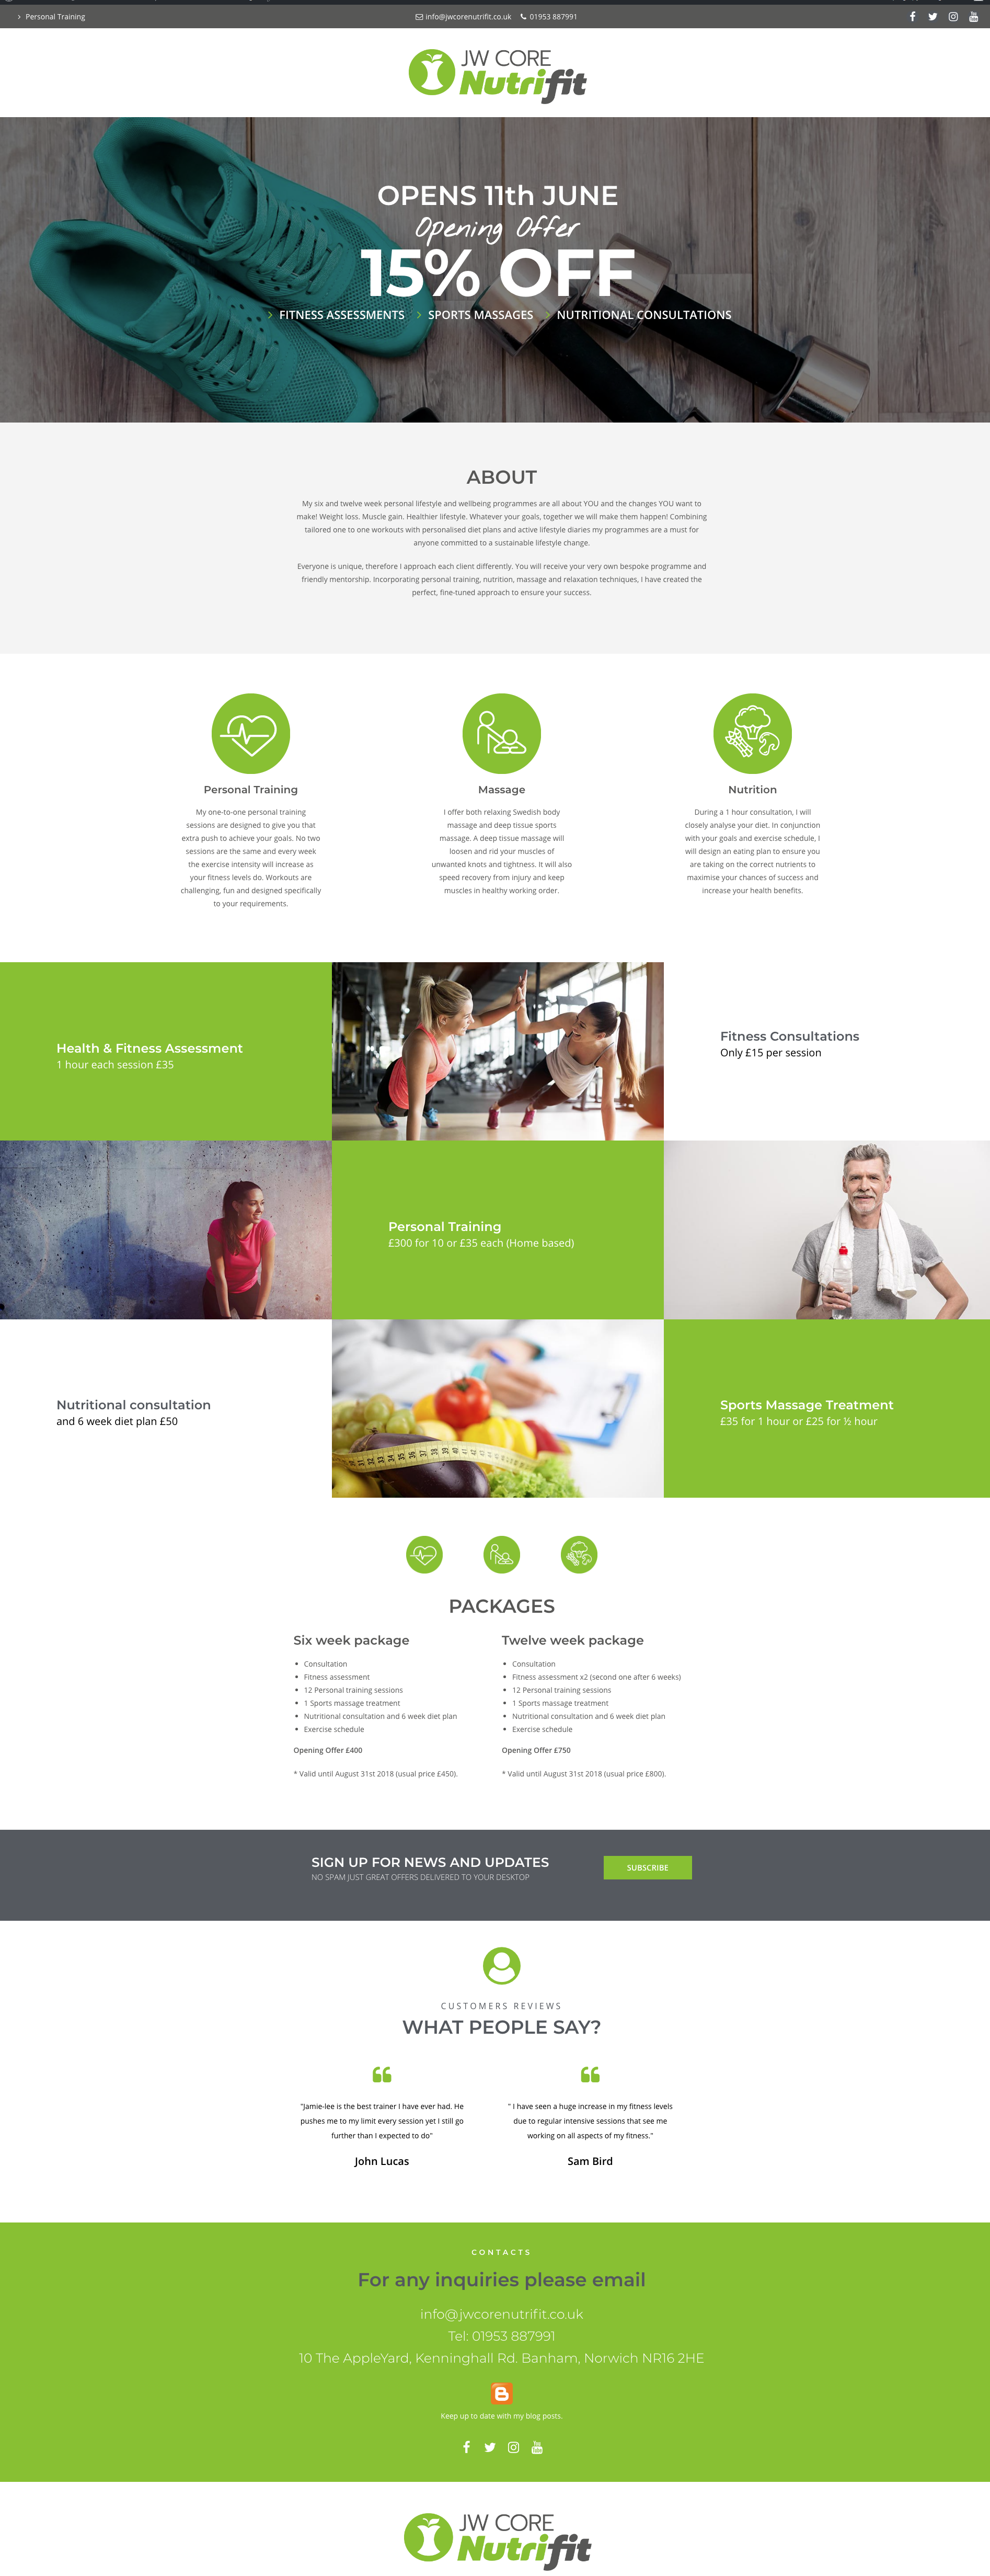 Wordpress Website For Jw Core Nutrifit Web Design Web Design Quotes App Design